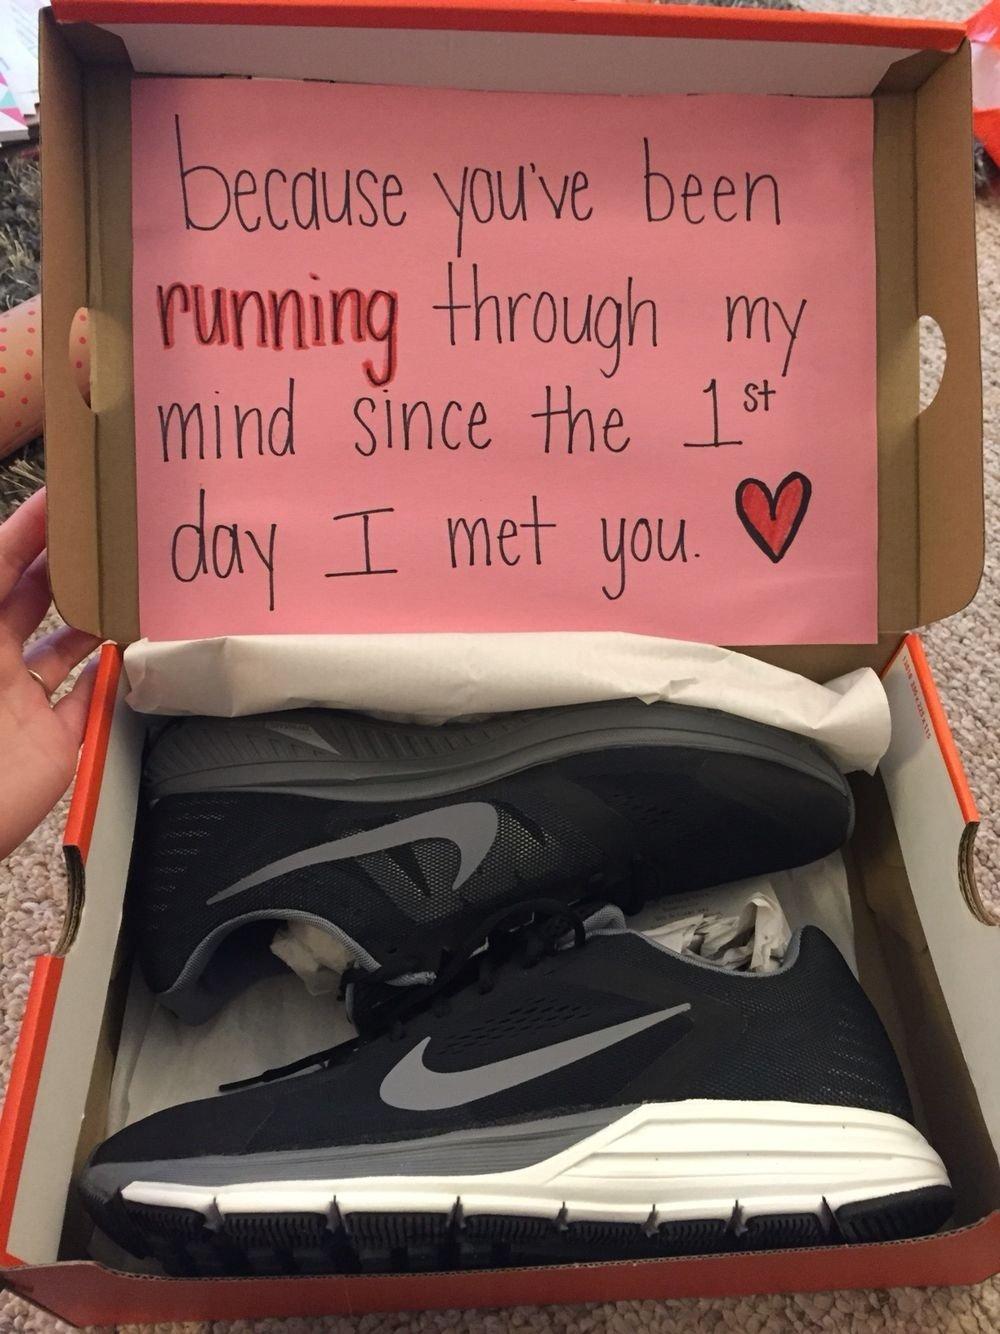 10 Beautiful Birthday Ideas For A Boyfriend gift ideas for him gift idea pinterest gift boyfriends and 15 2020